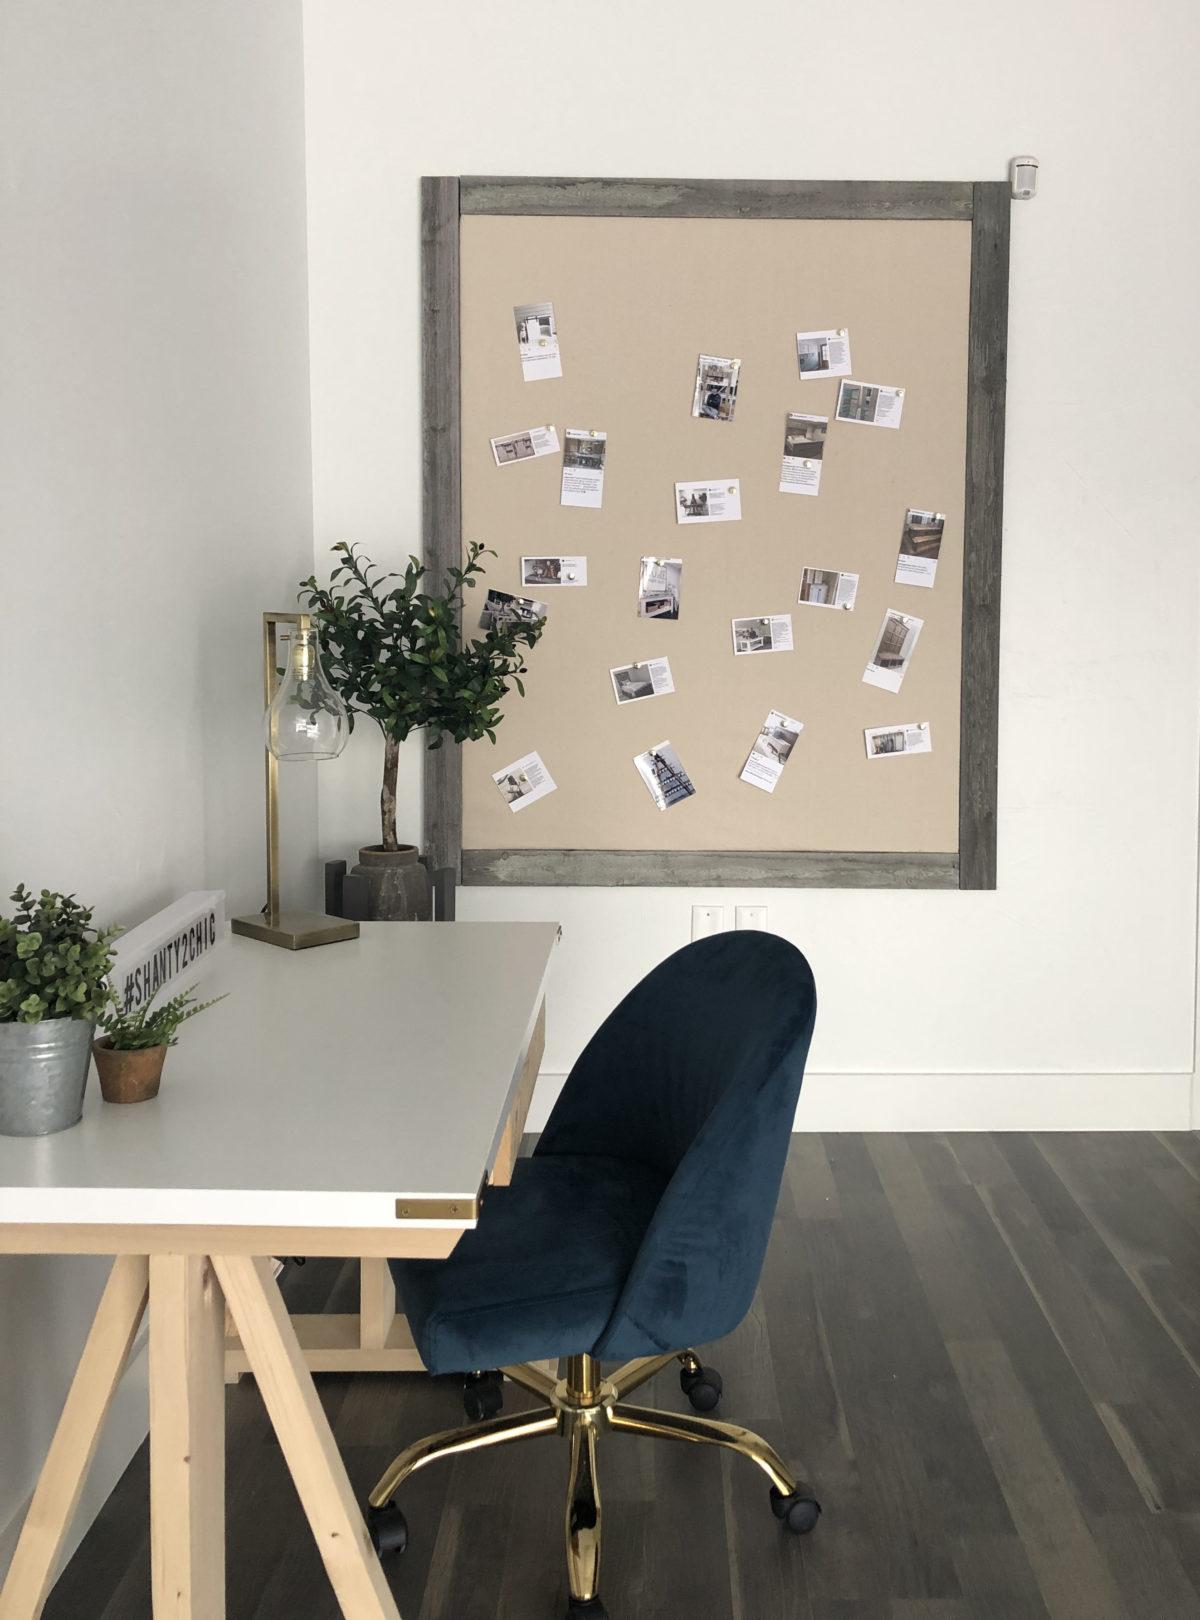 DIY Rustic Wall Memo Board using Insulation